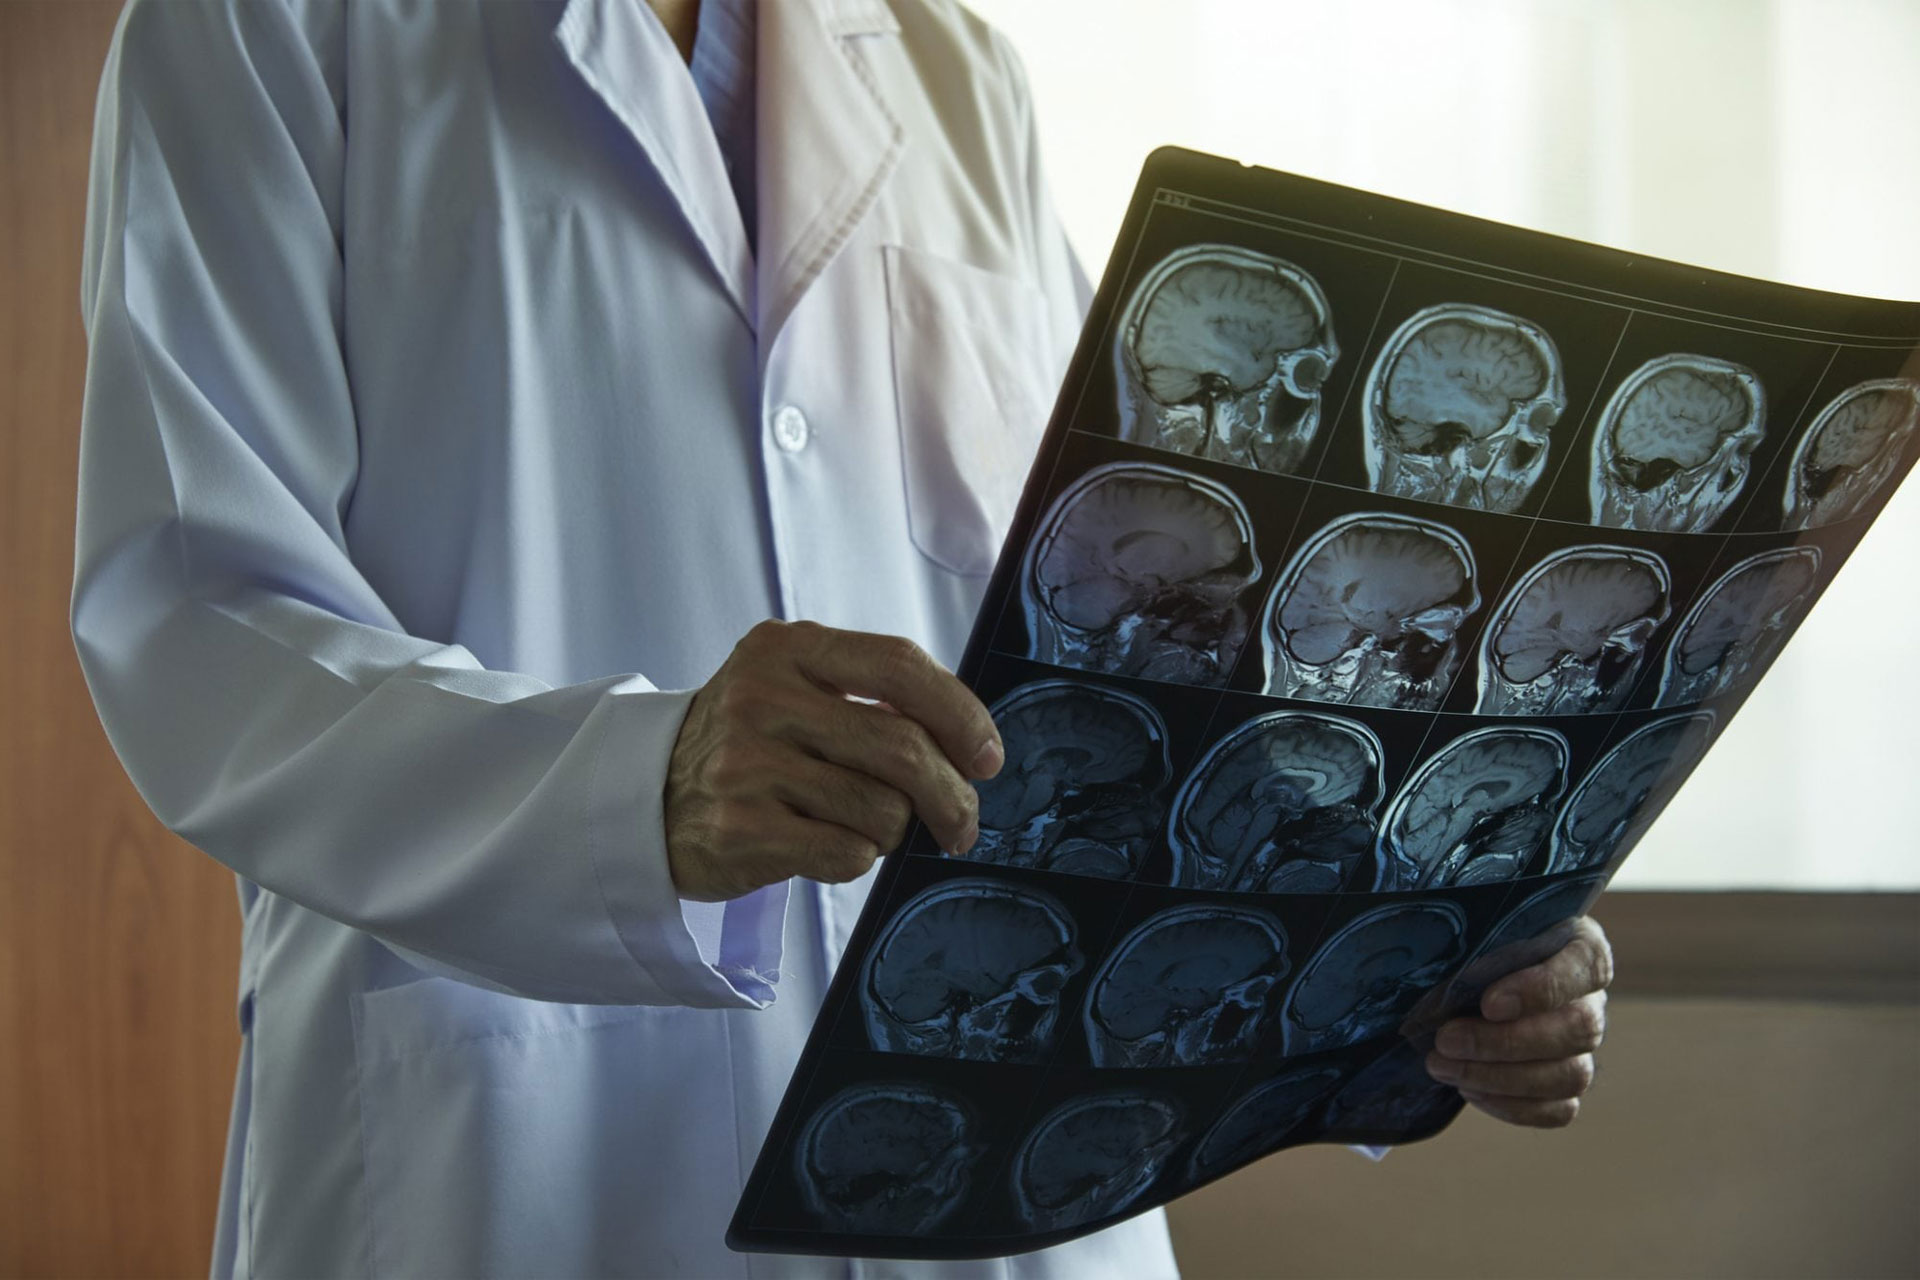 neurochirurgie-aparatura-si-instrumentar-in-oferta